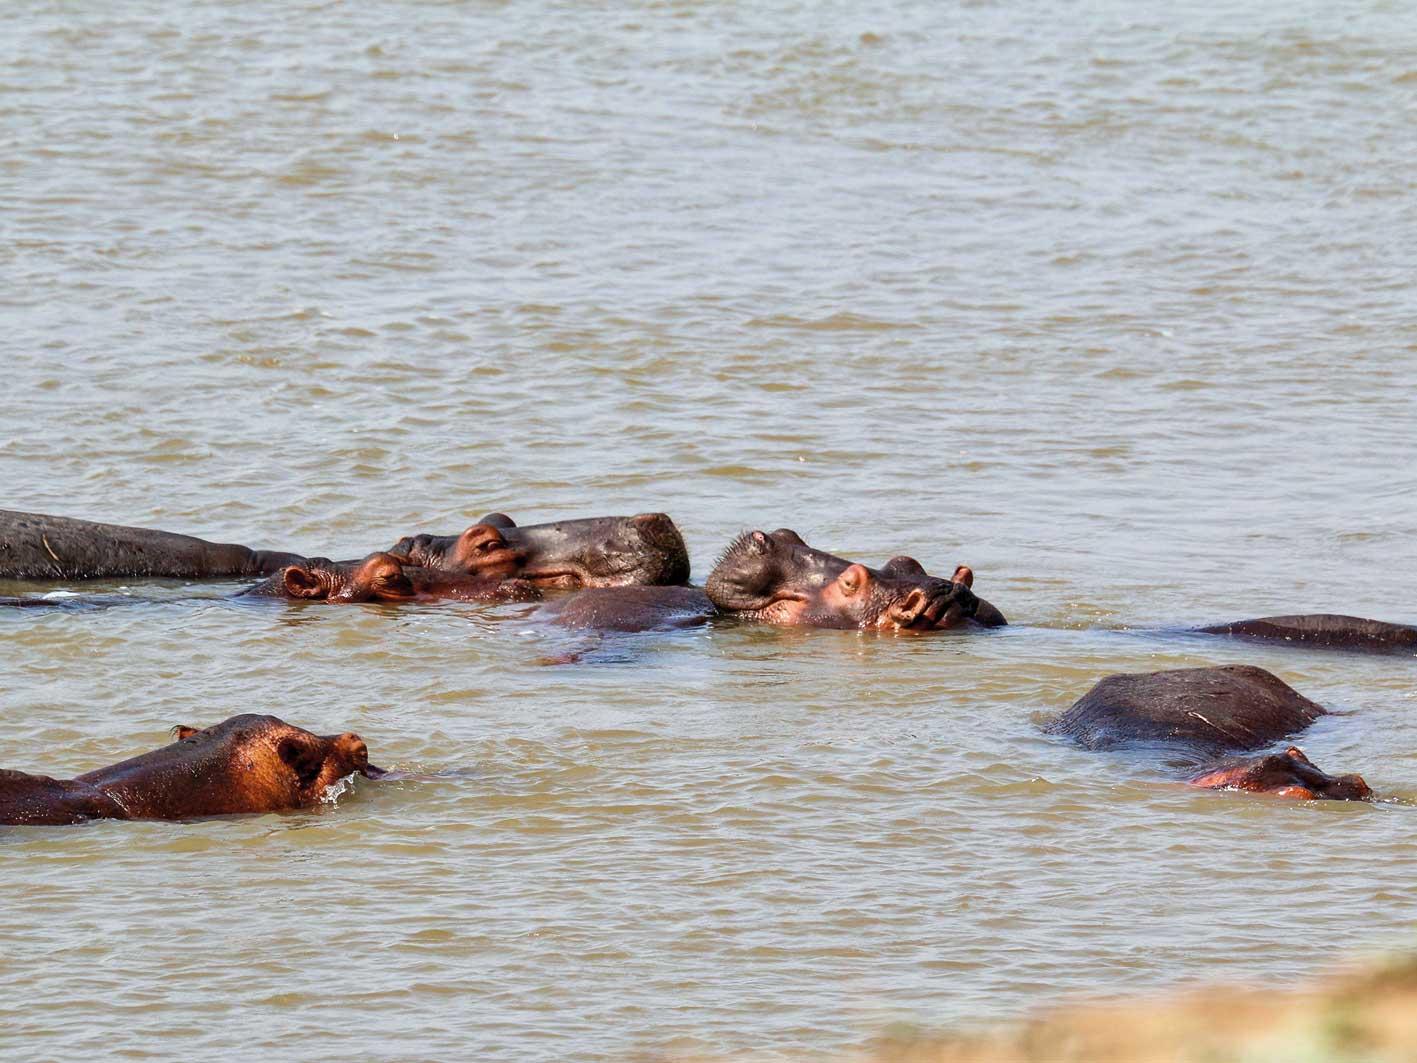 Nilpferde im Fluss, Zambia-Safari